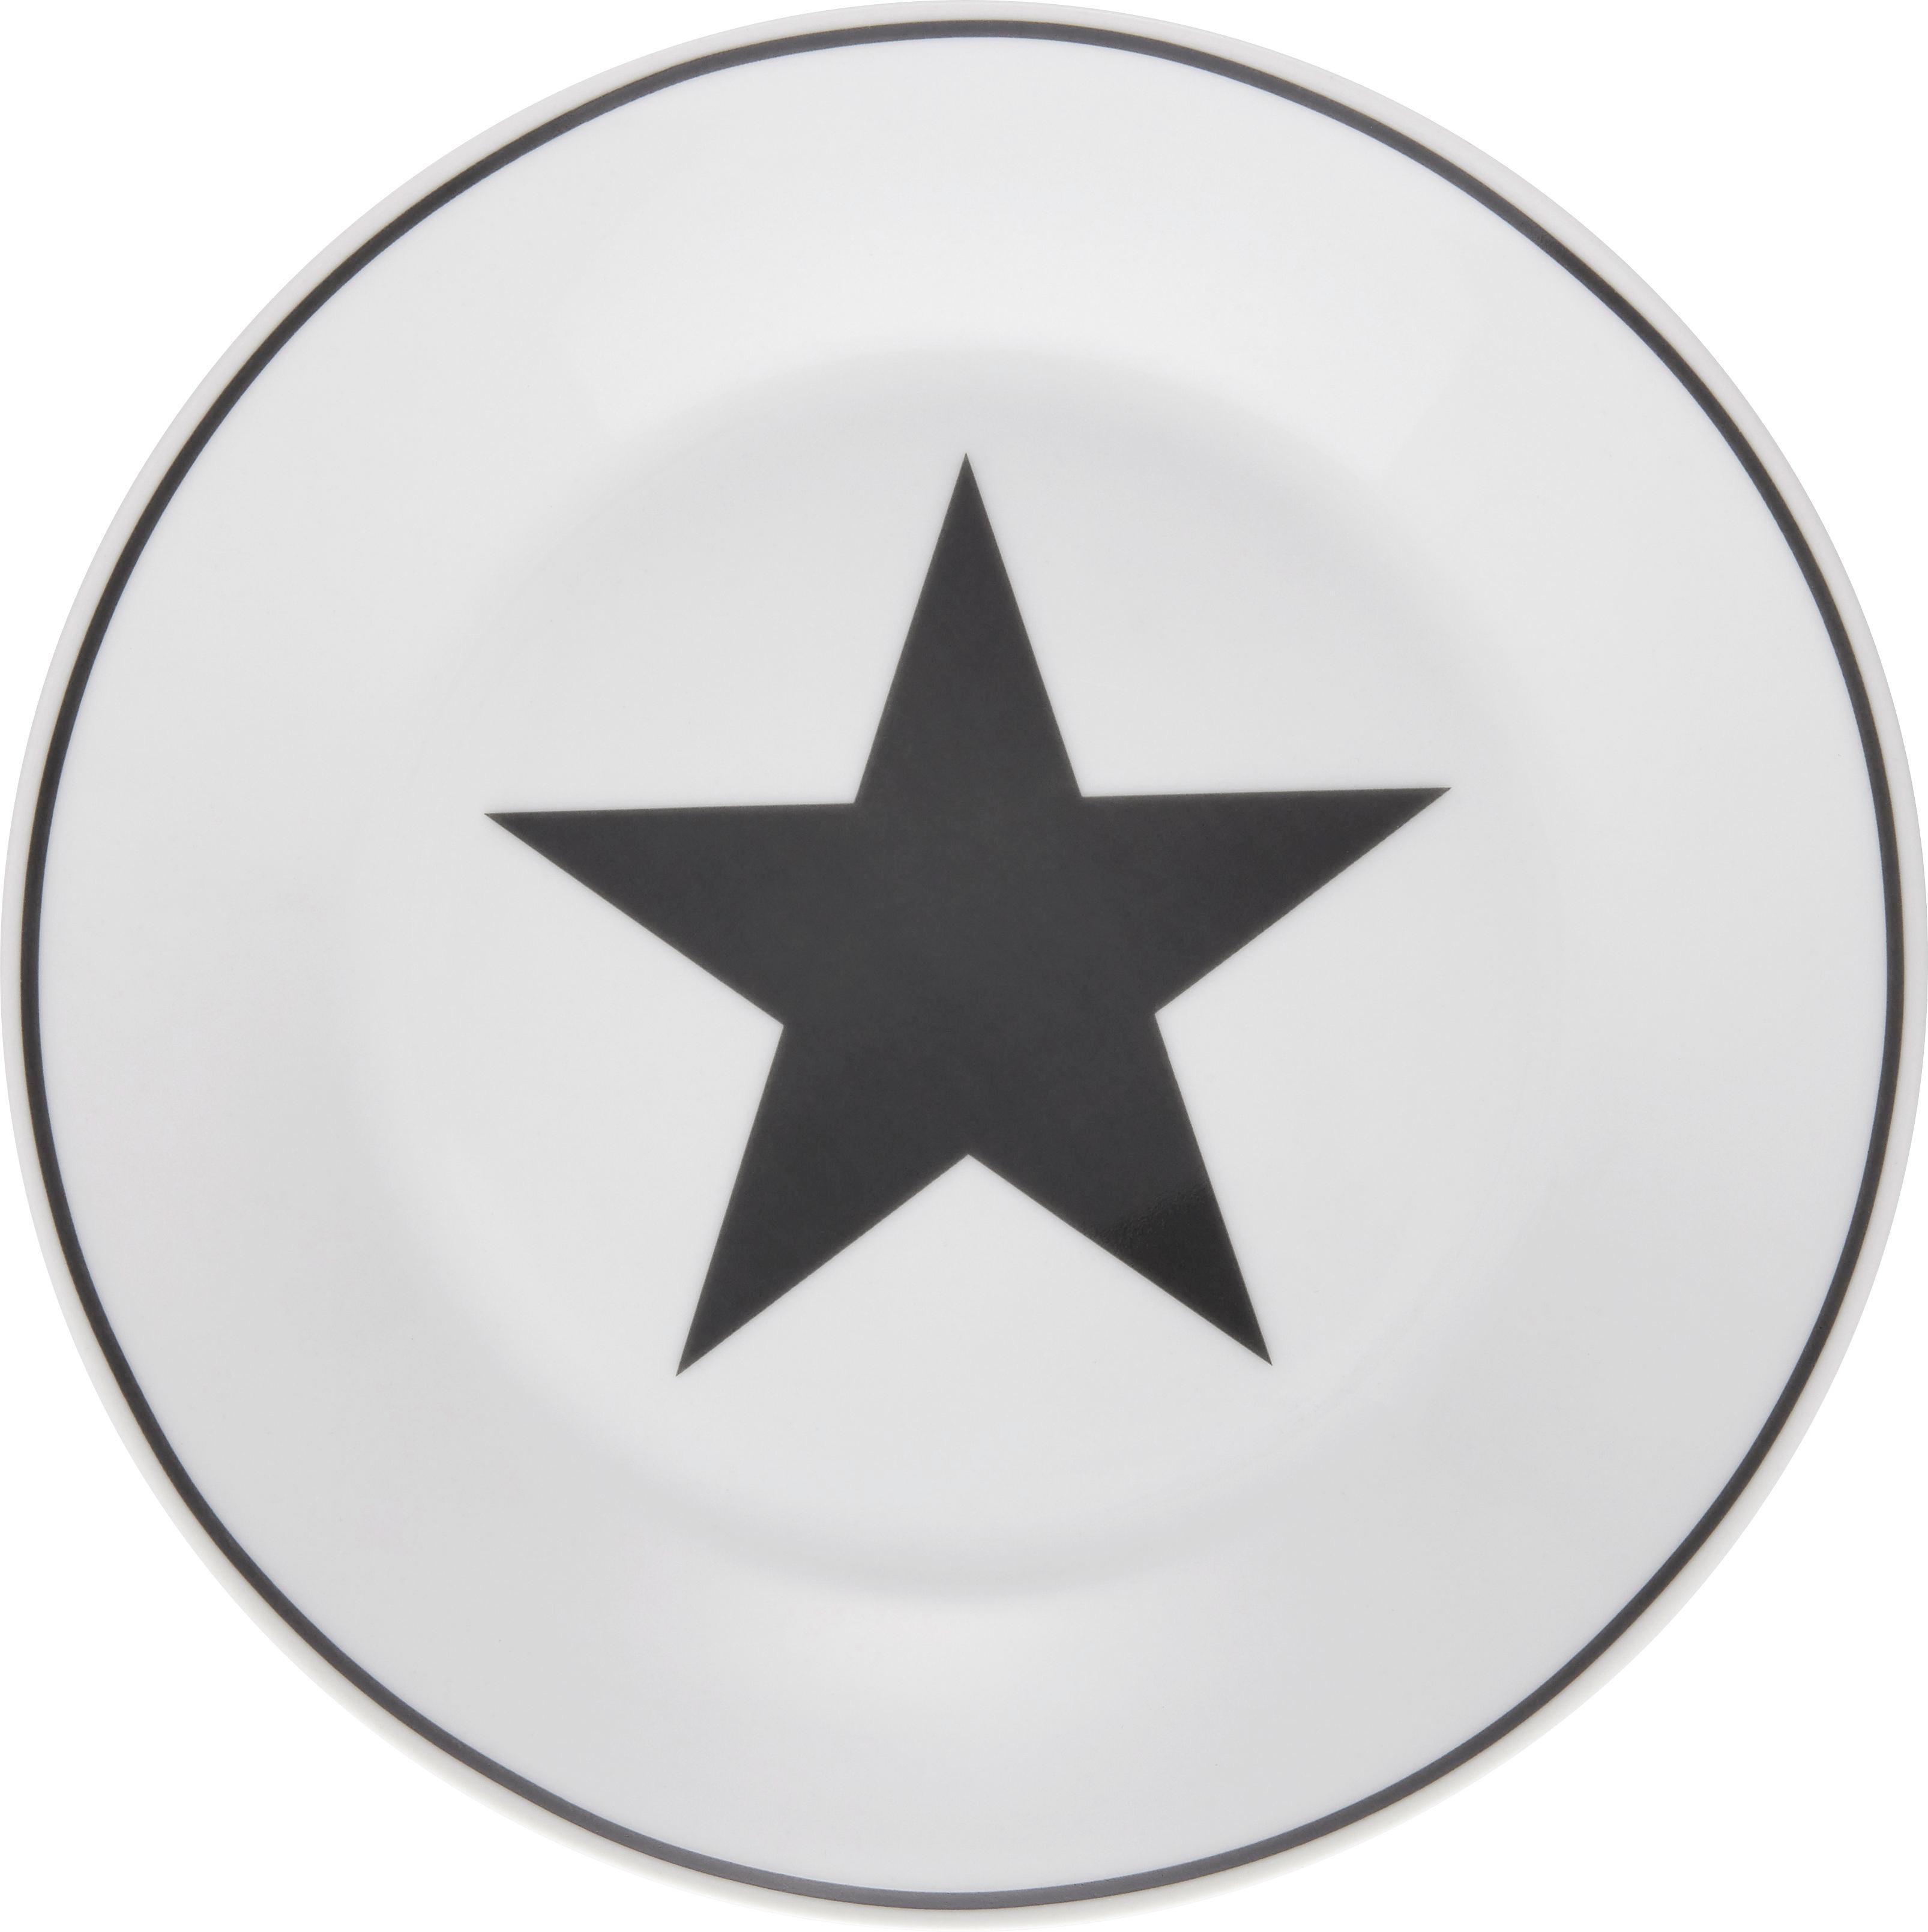 Desertni Krožnik Star - bela/antracit, Moderno, keramika (20,32cm) - MÖMAX modern living